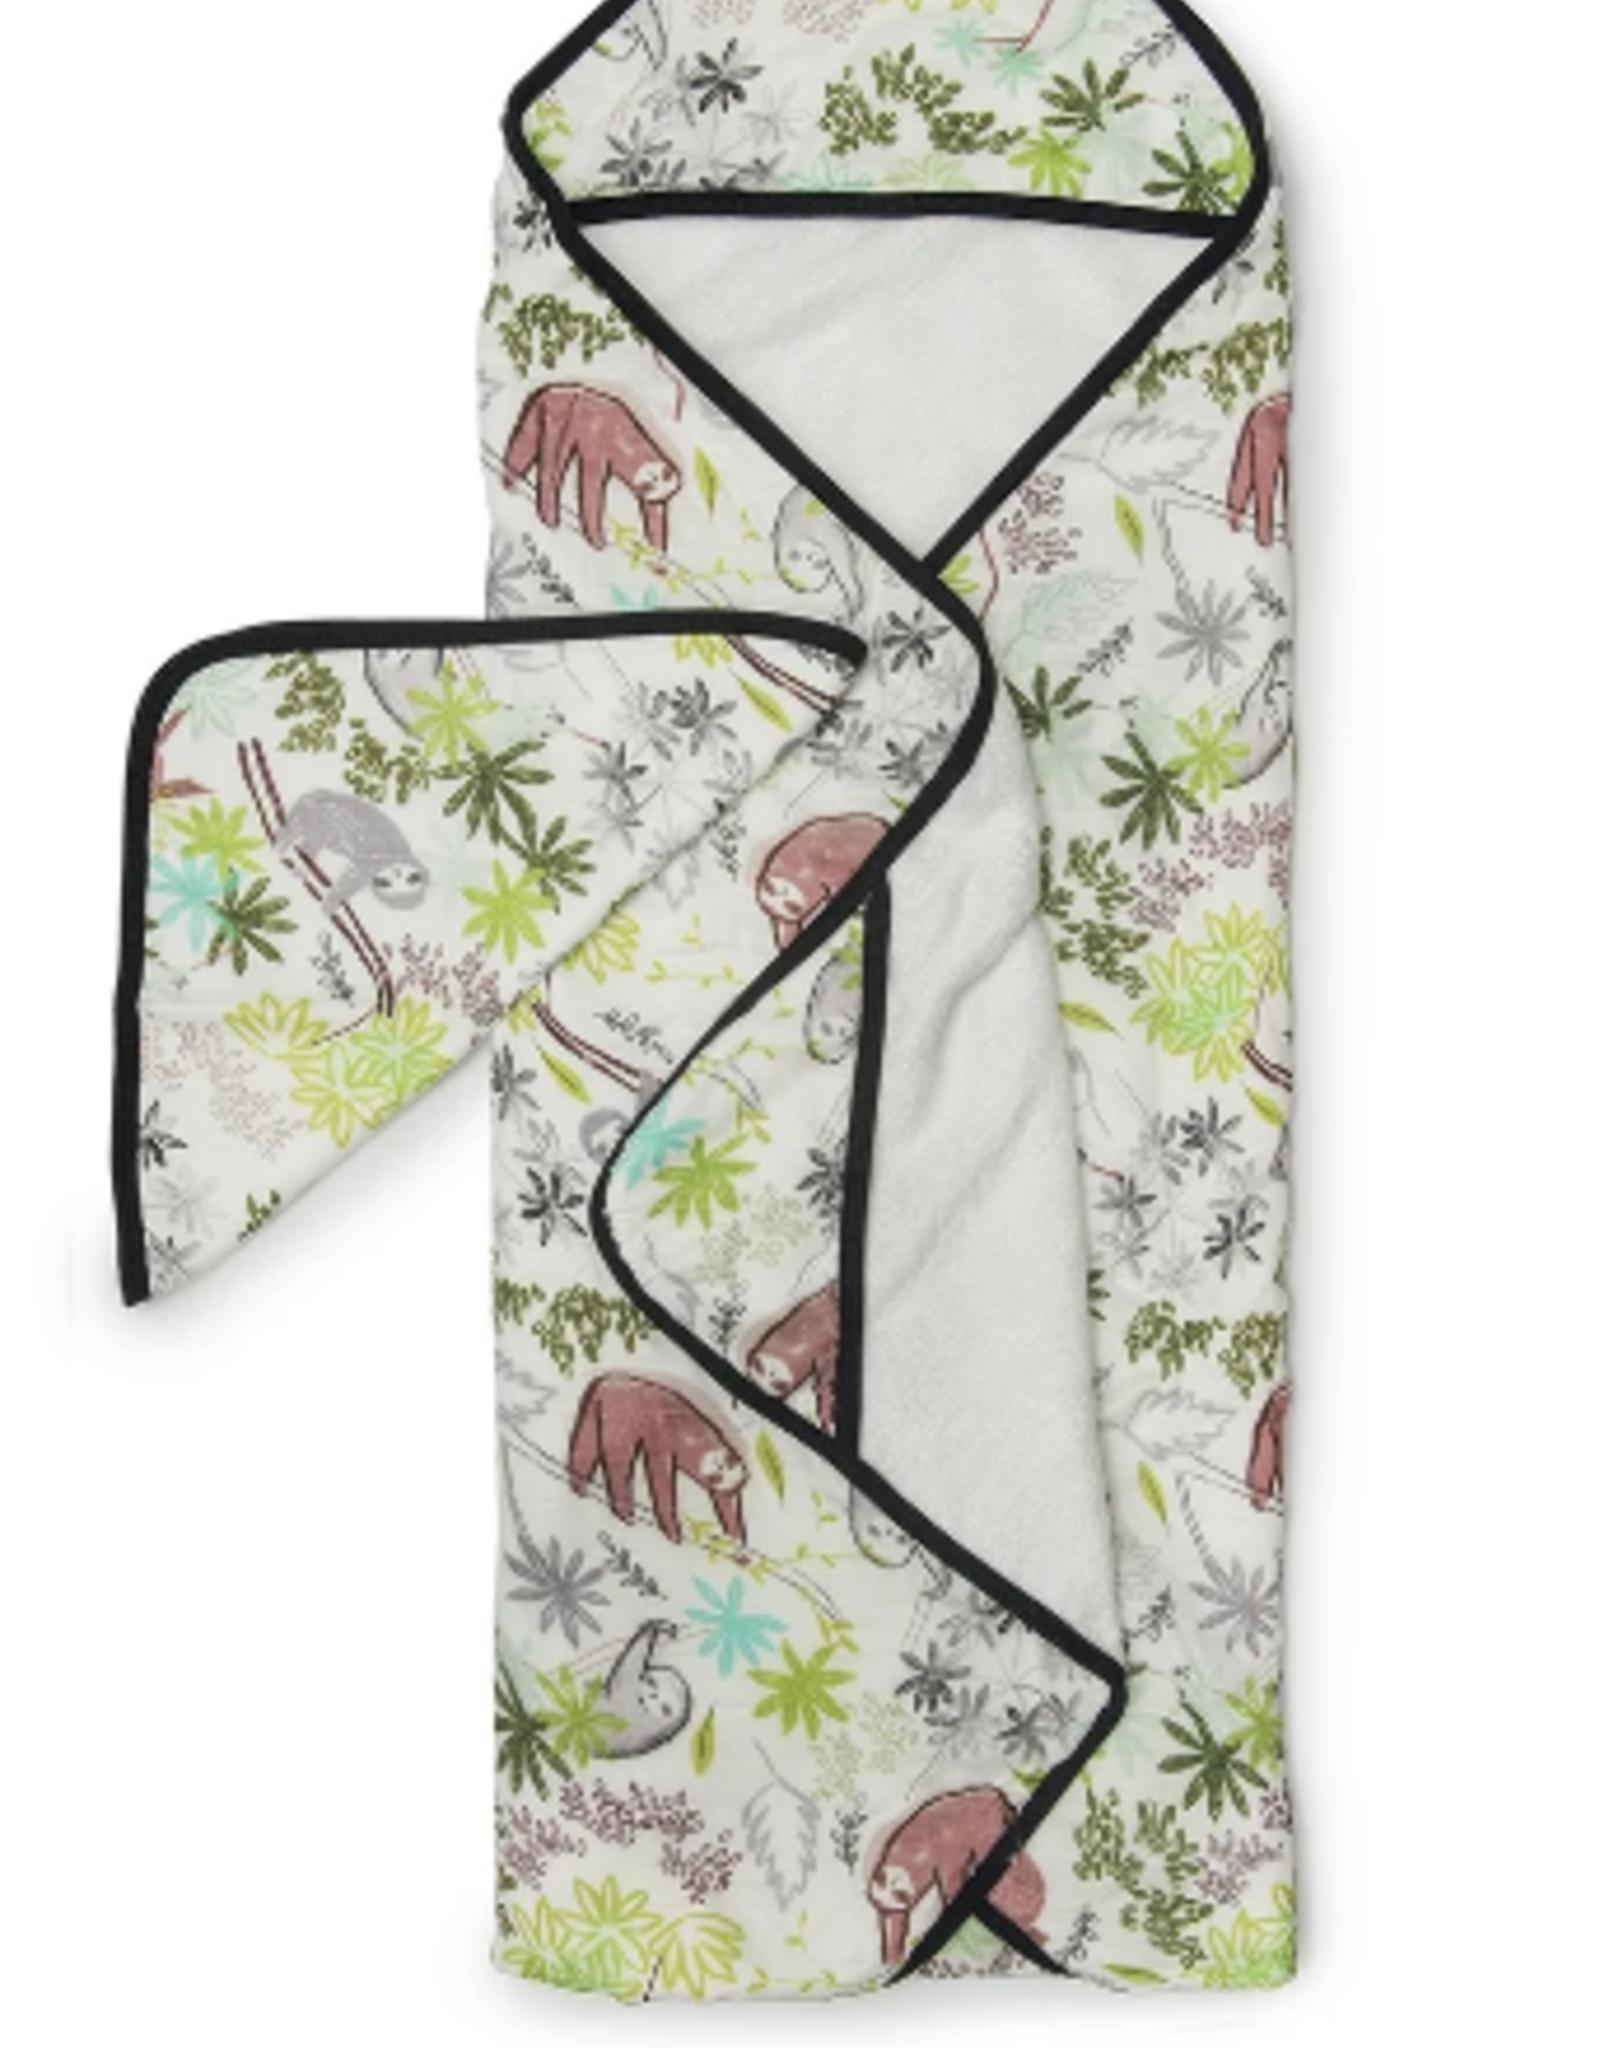 loulou LOLLIPOP loulou LOLLIPOP - Hooded Towel Set